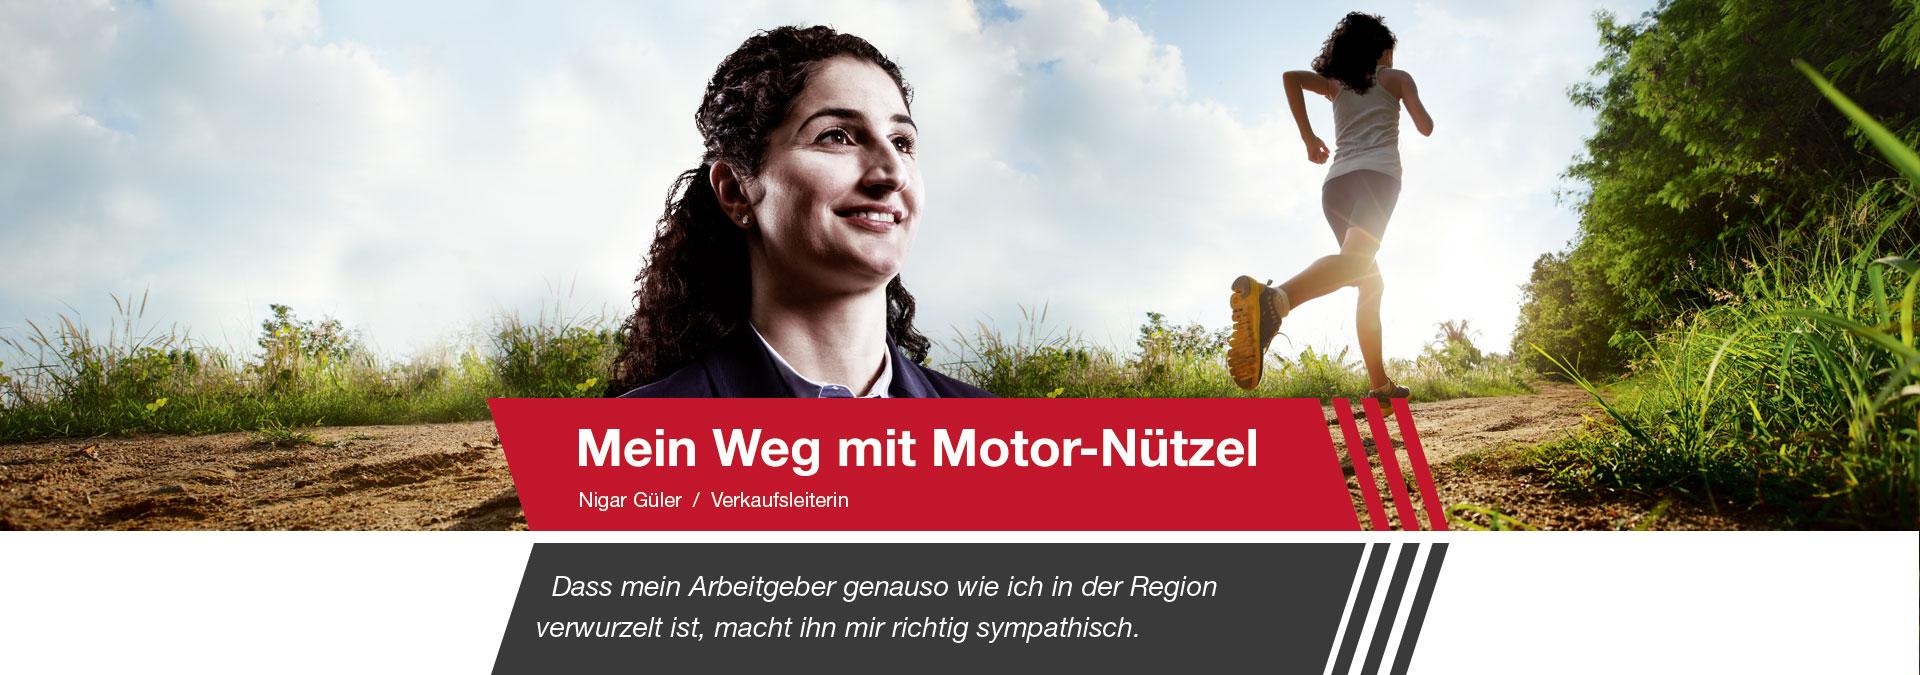 Nigar Güler ist Verkaufsleiterin bei Motor-Nützel